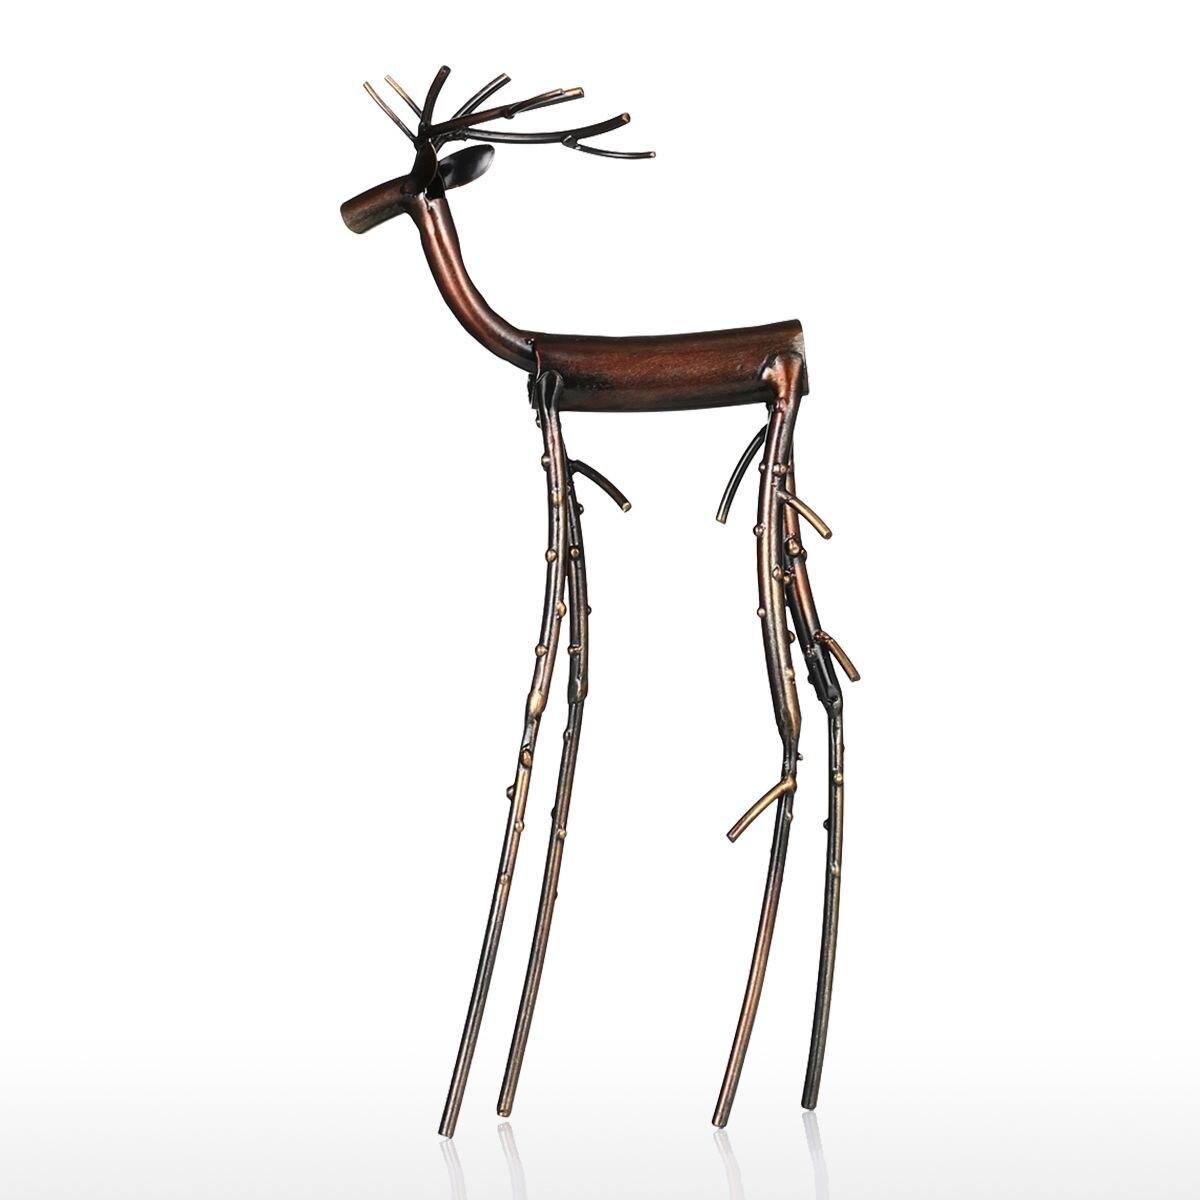 Black Long Leg Moose Figurine Iron Home Decoration Crafts Rhaliexpress: Moose Figurines In Home Decor At Home Improvement Advice